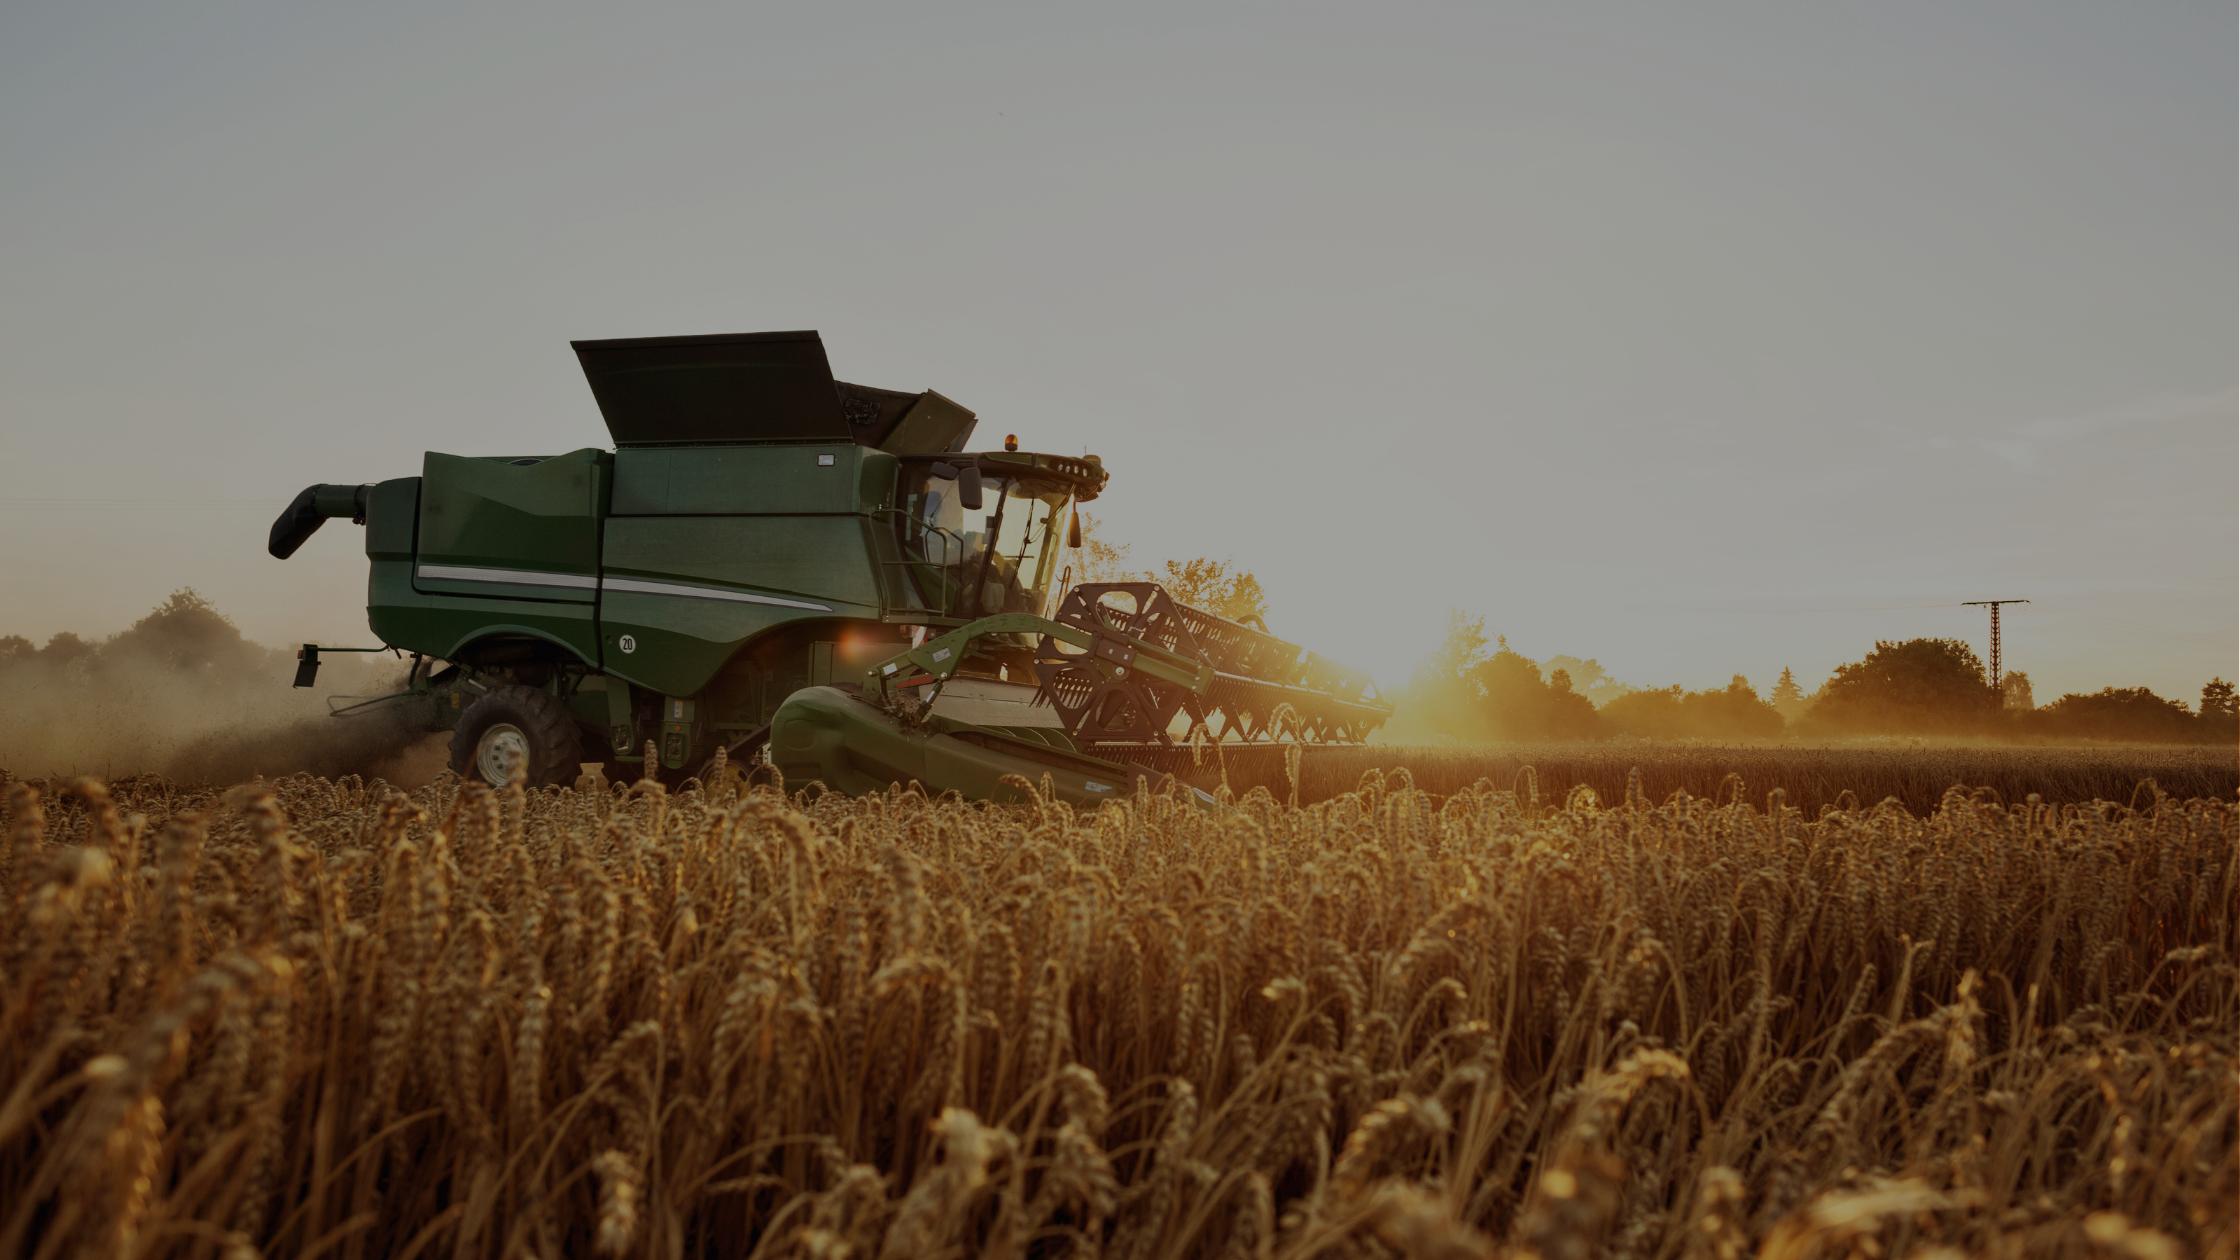 Harvest the Sun: A Farmer's Guide to Going Solar